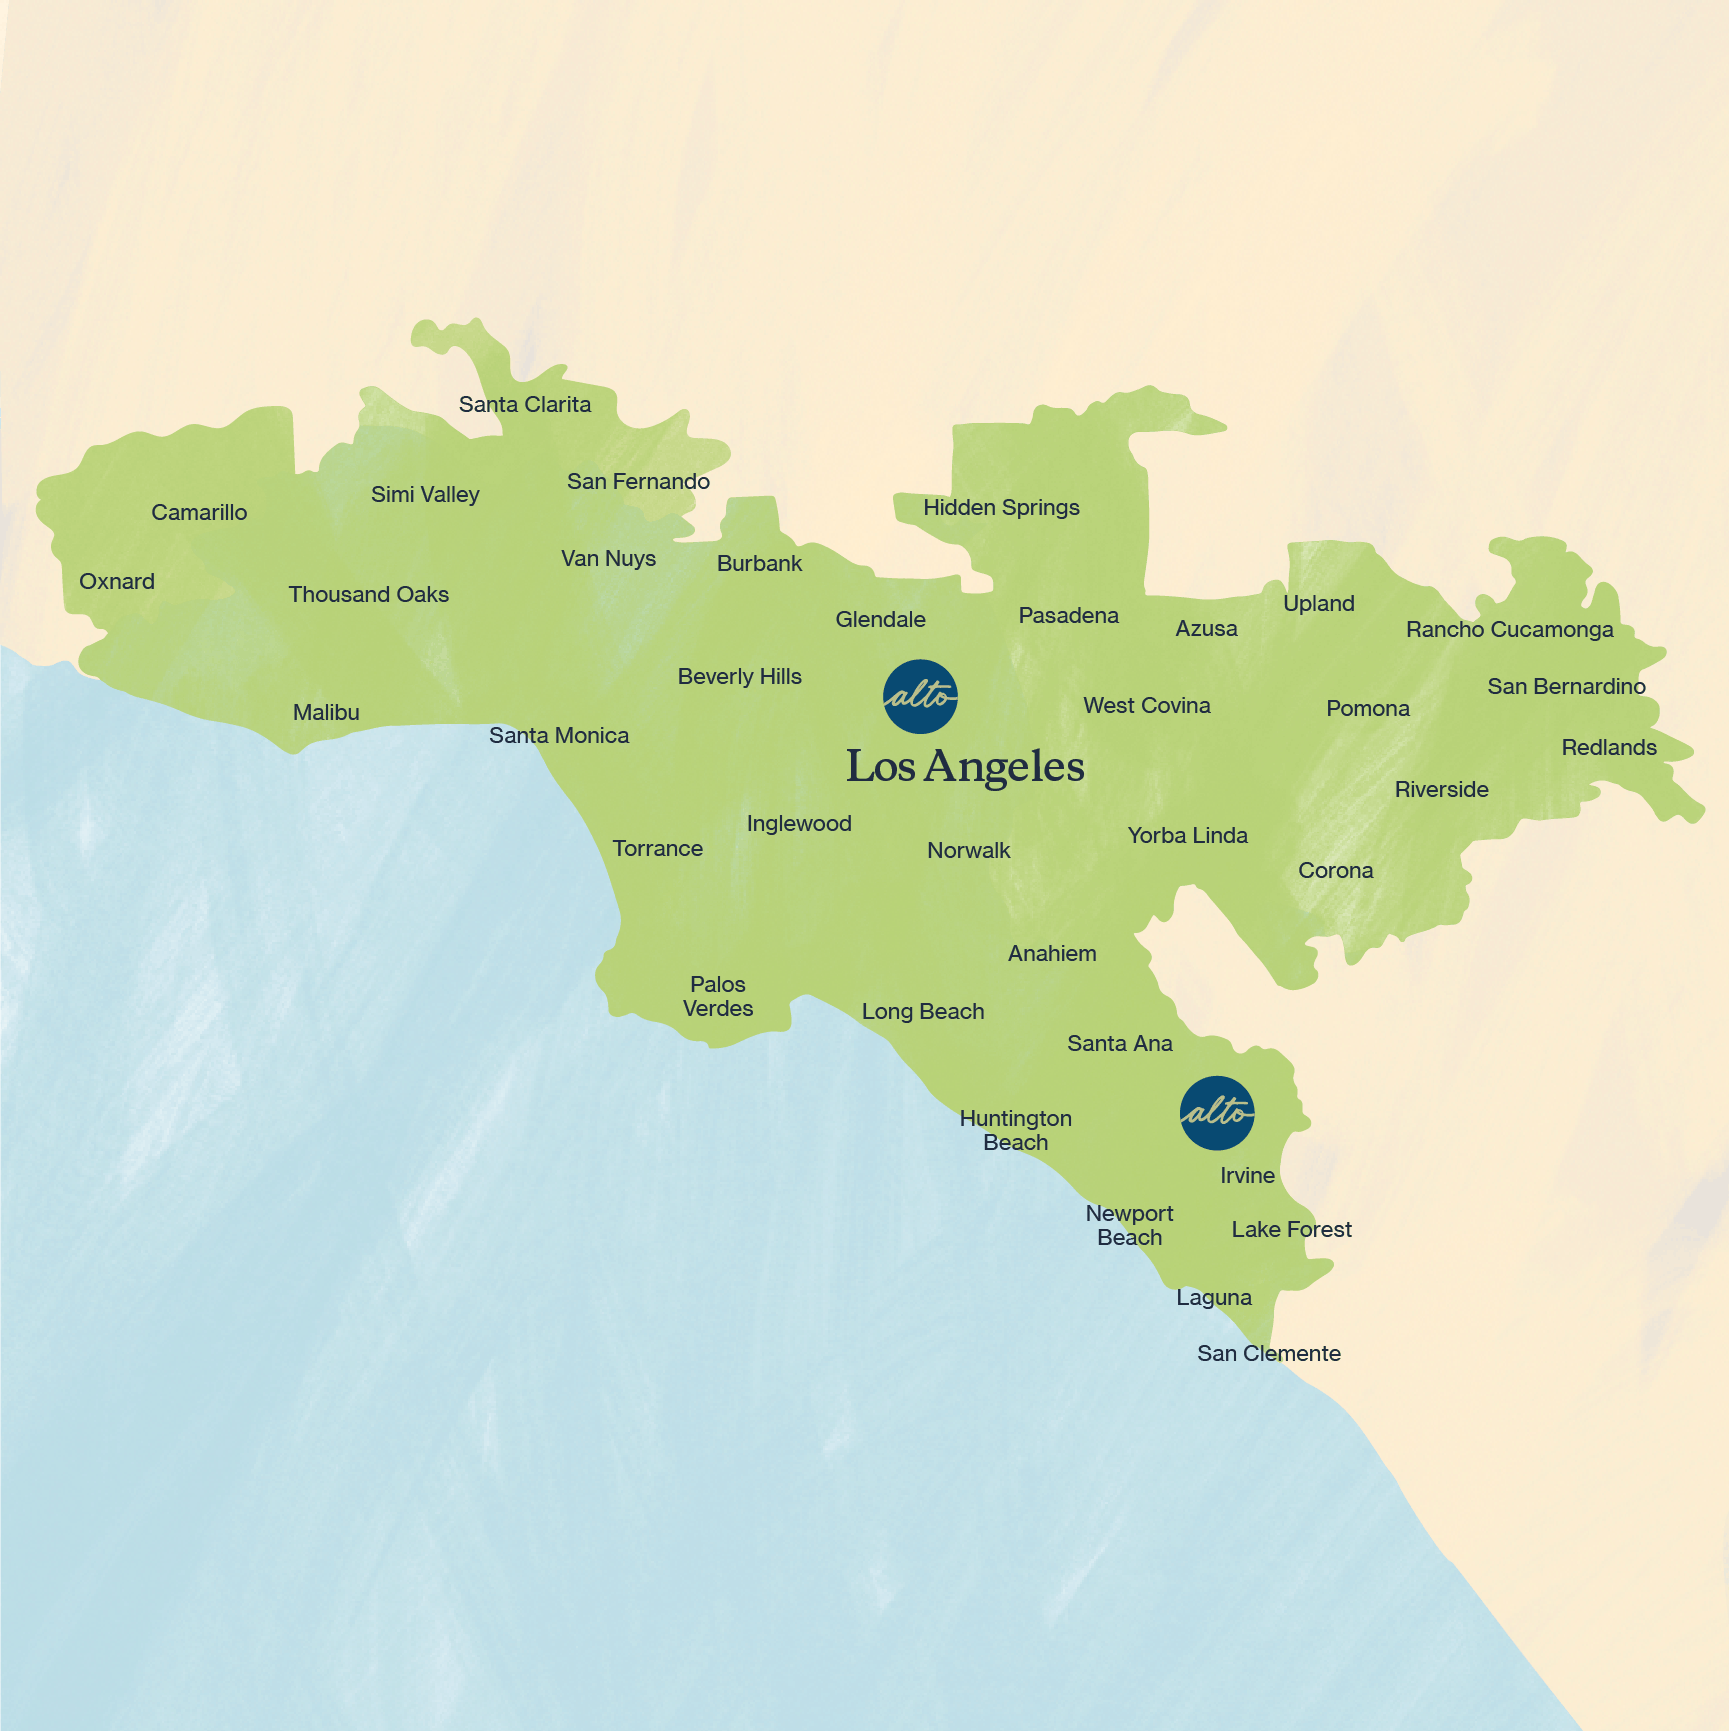 Los Angeles and Orange County